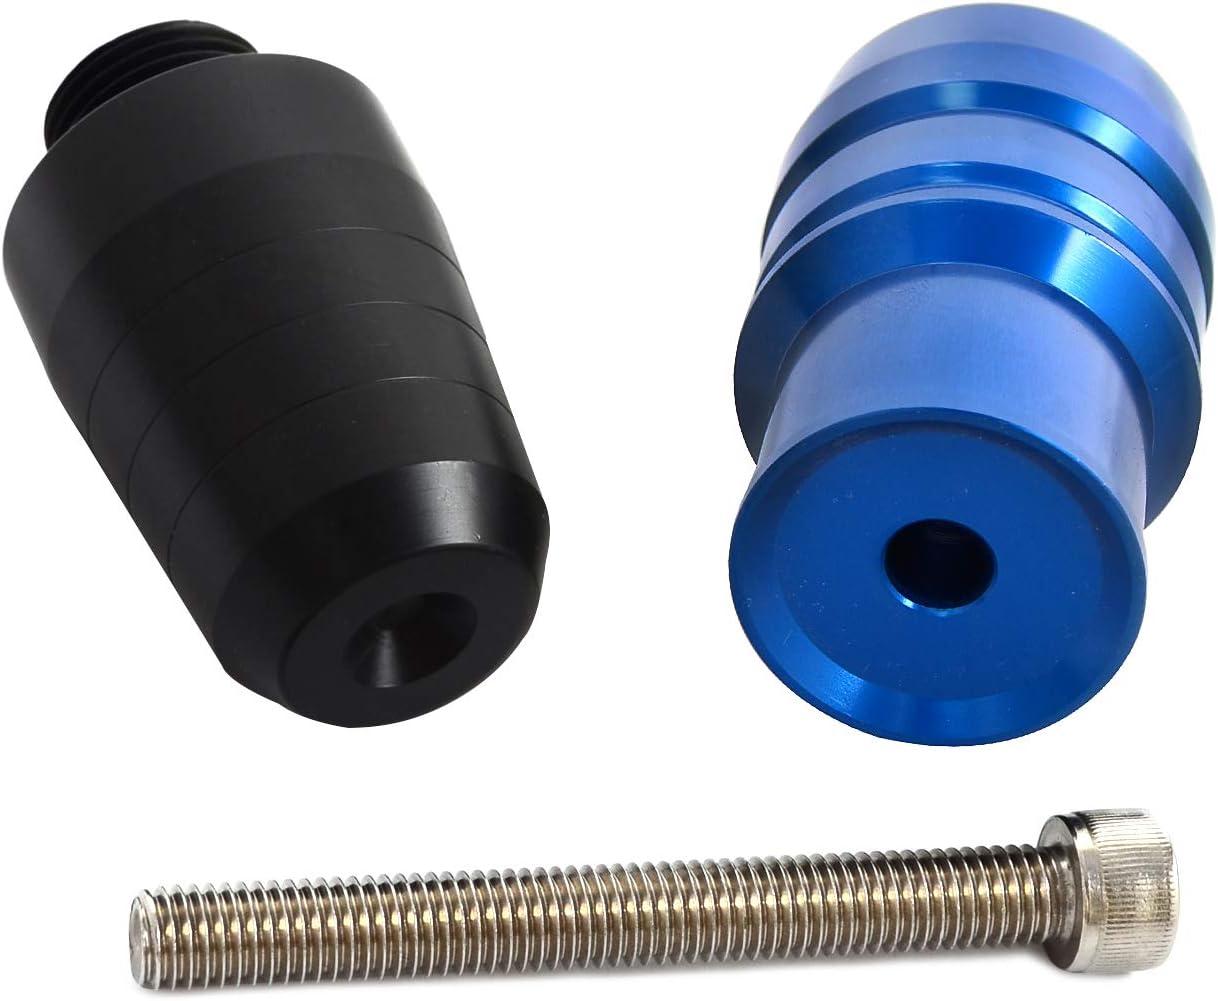 Nicecnc Glod Crash Pads Exhaust Sliders Body Protector Replace YAMAHA /YZF-R3//MT-03 2015-2016,HONDA CB1100 2010-2016 CB1100EX 2013 2014 2015